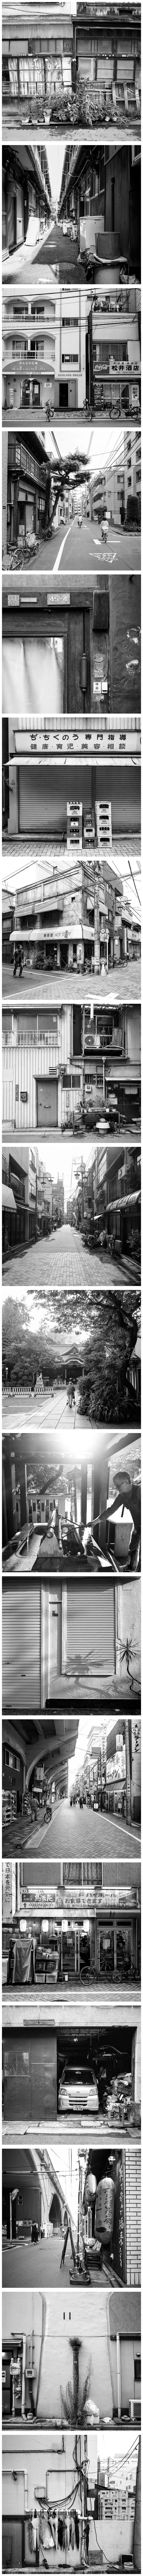 A walk through Taito-ku, Tokyo, Japan